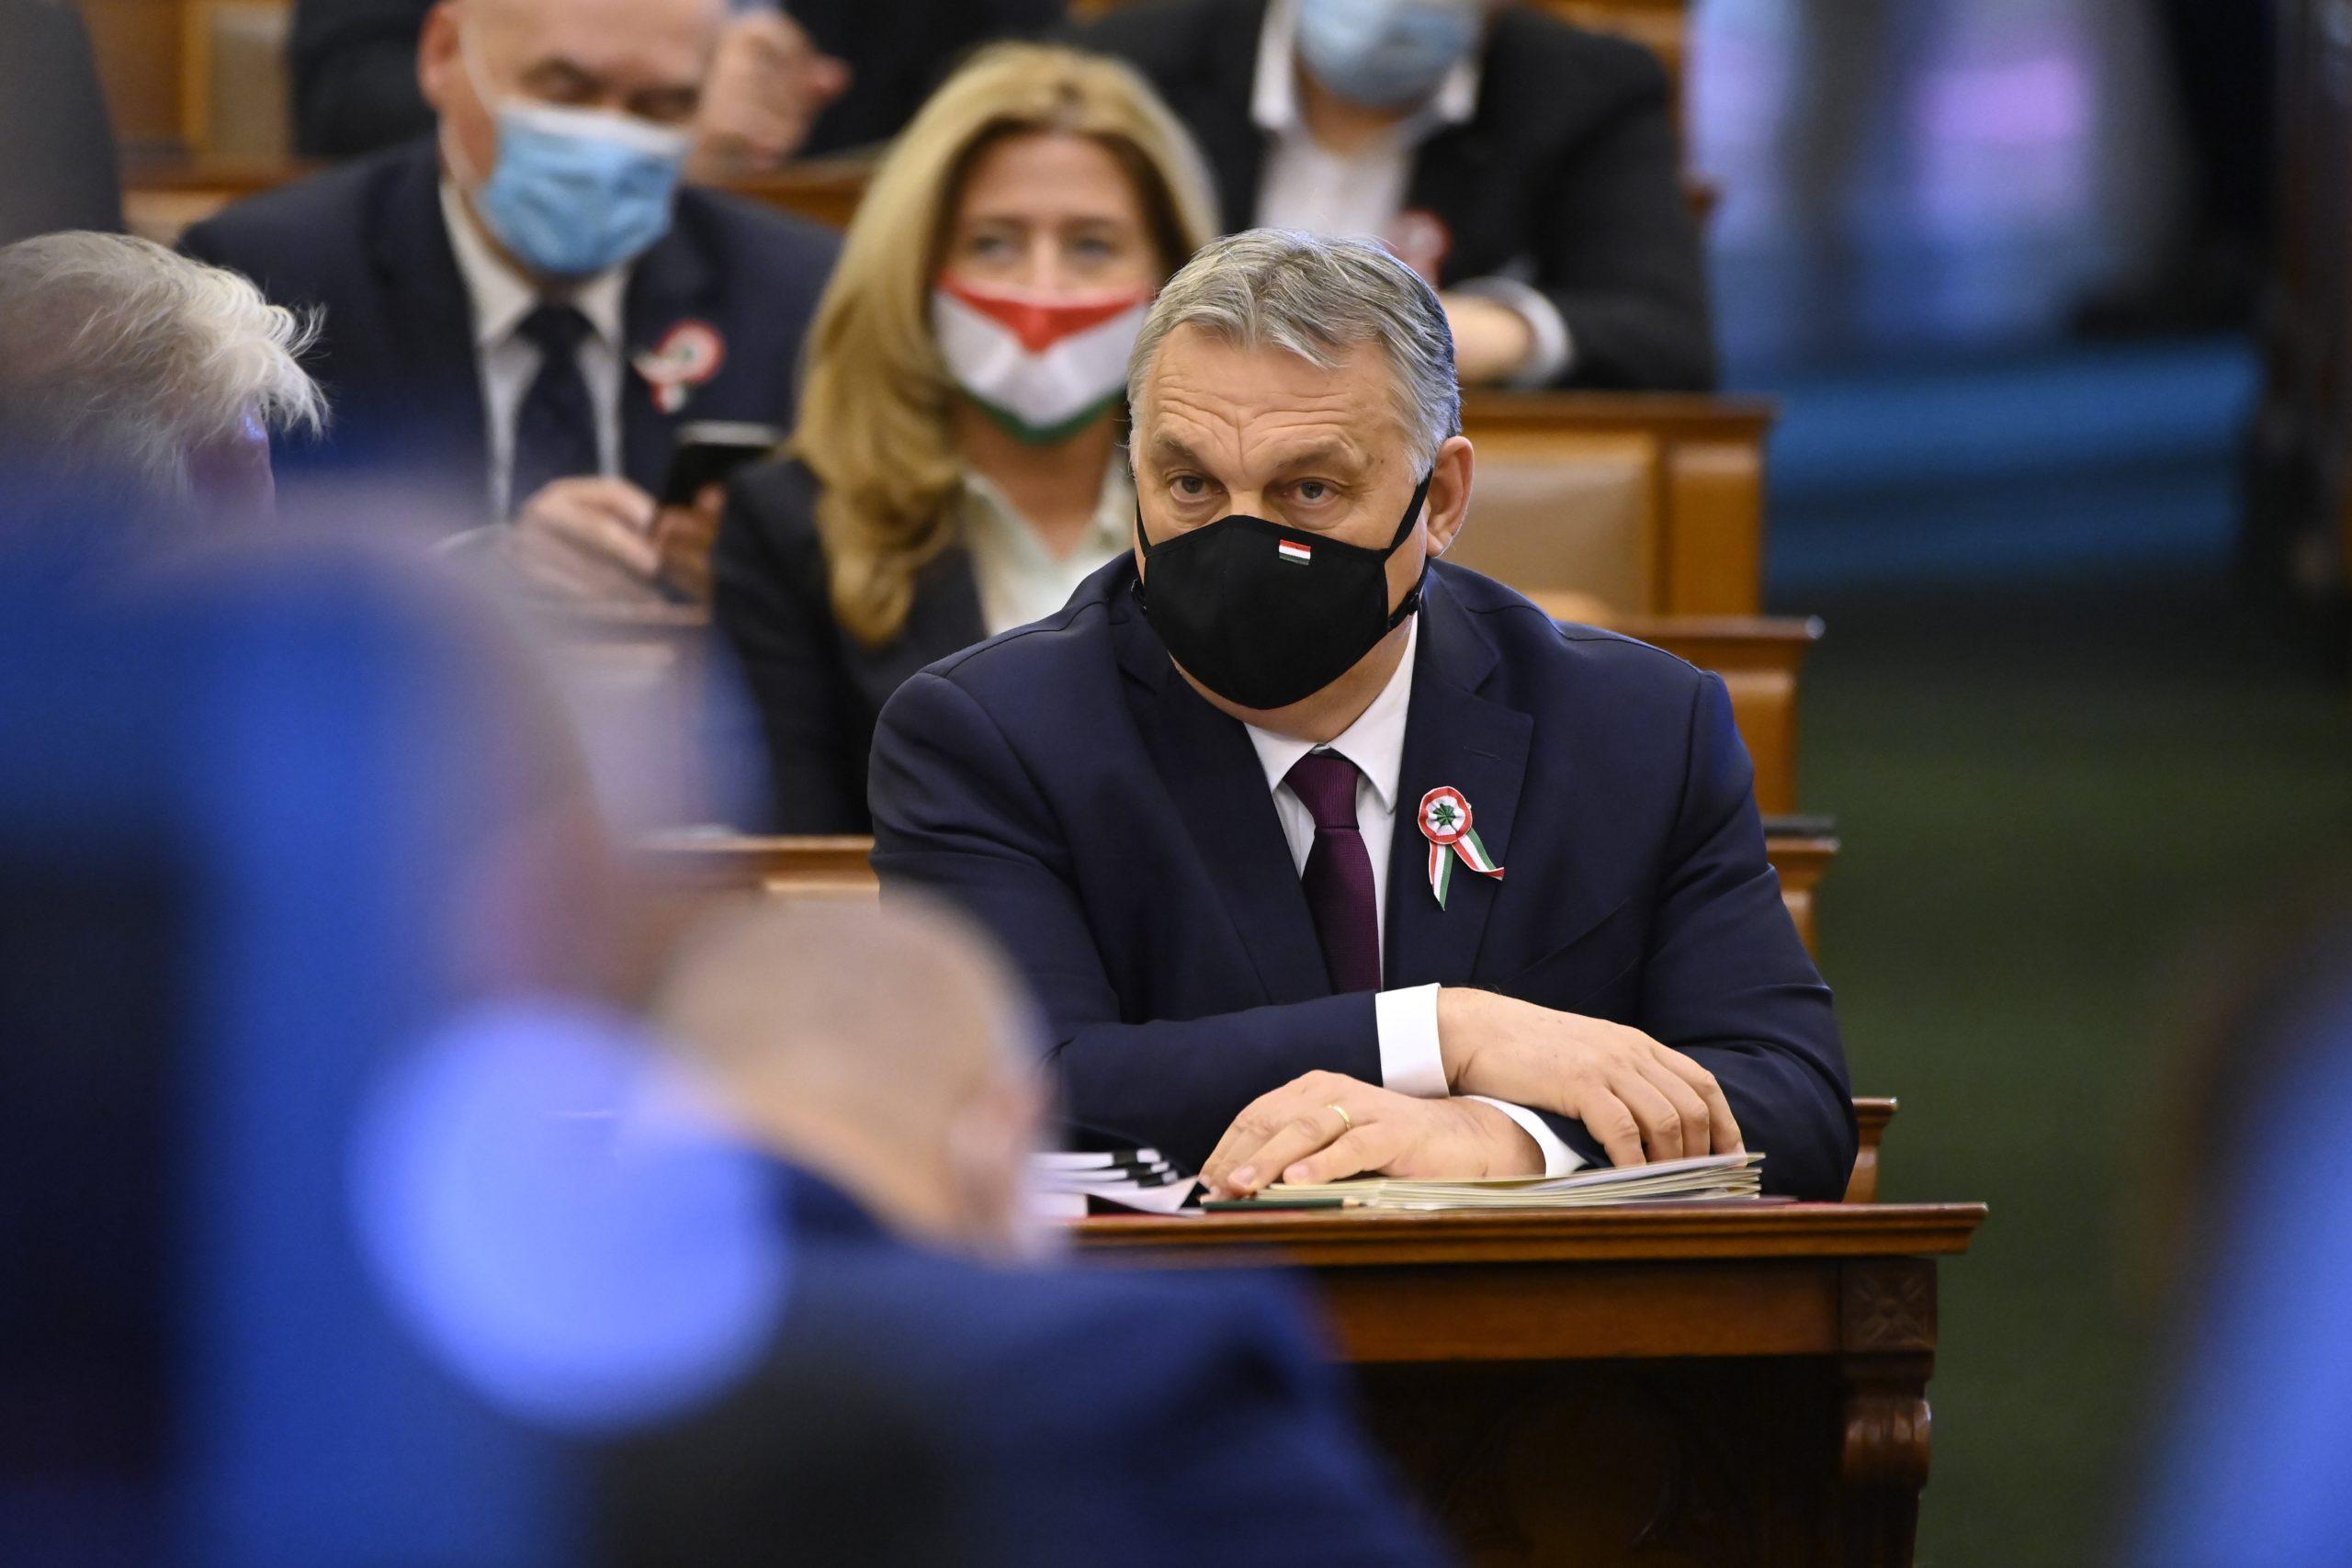 Opposition im Parlament: